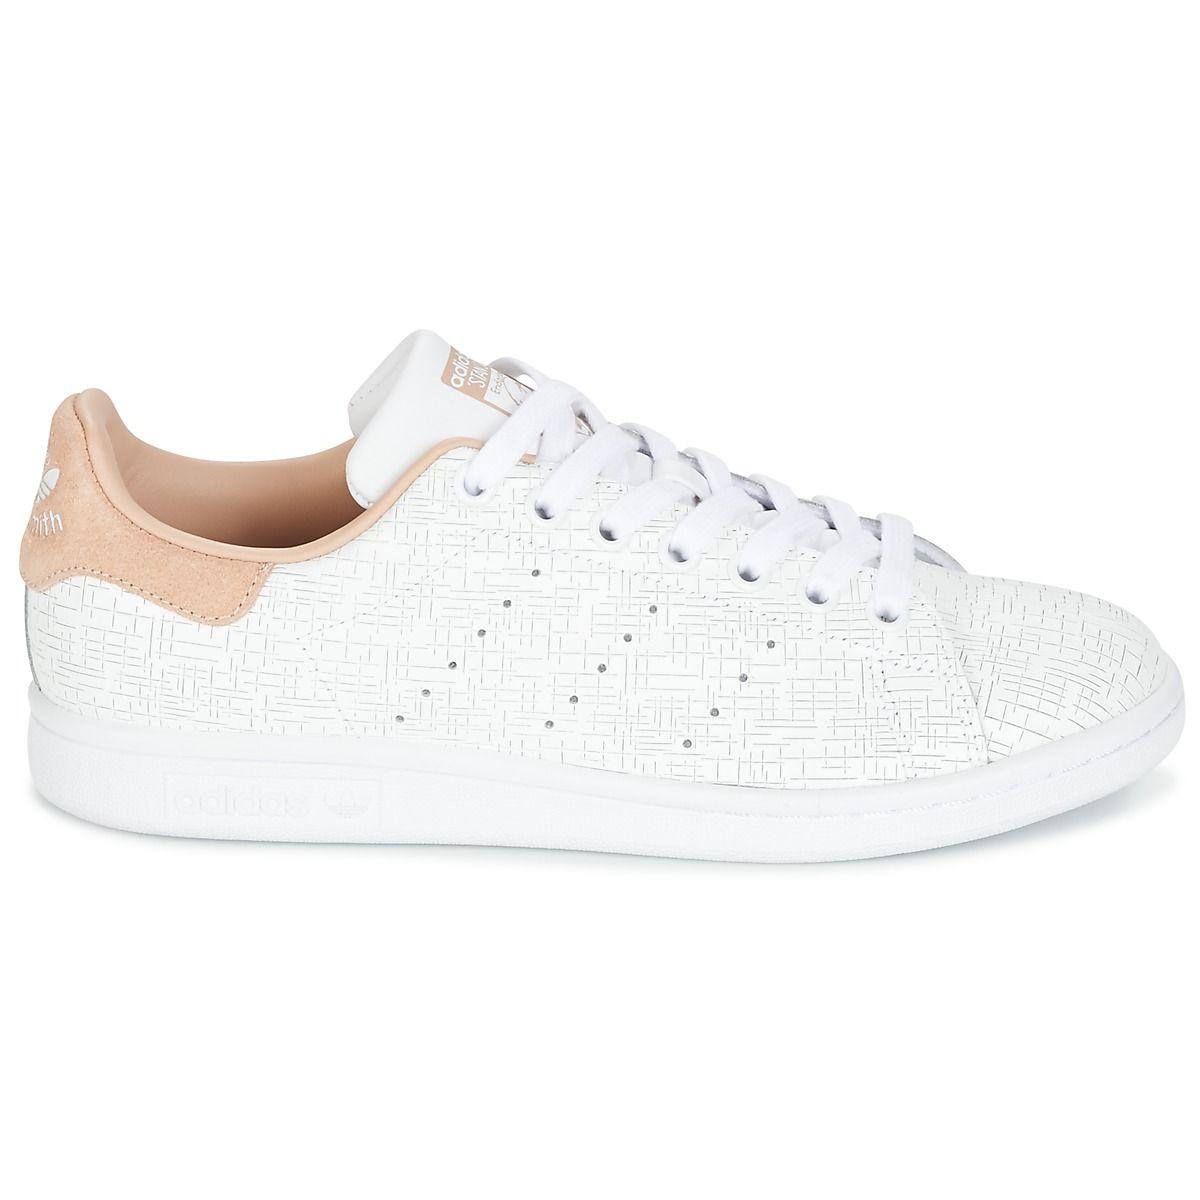 ADIDAS ORIGINALS - Sneakers STAN SMITH W - Bianco / Rosa ...